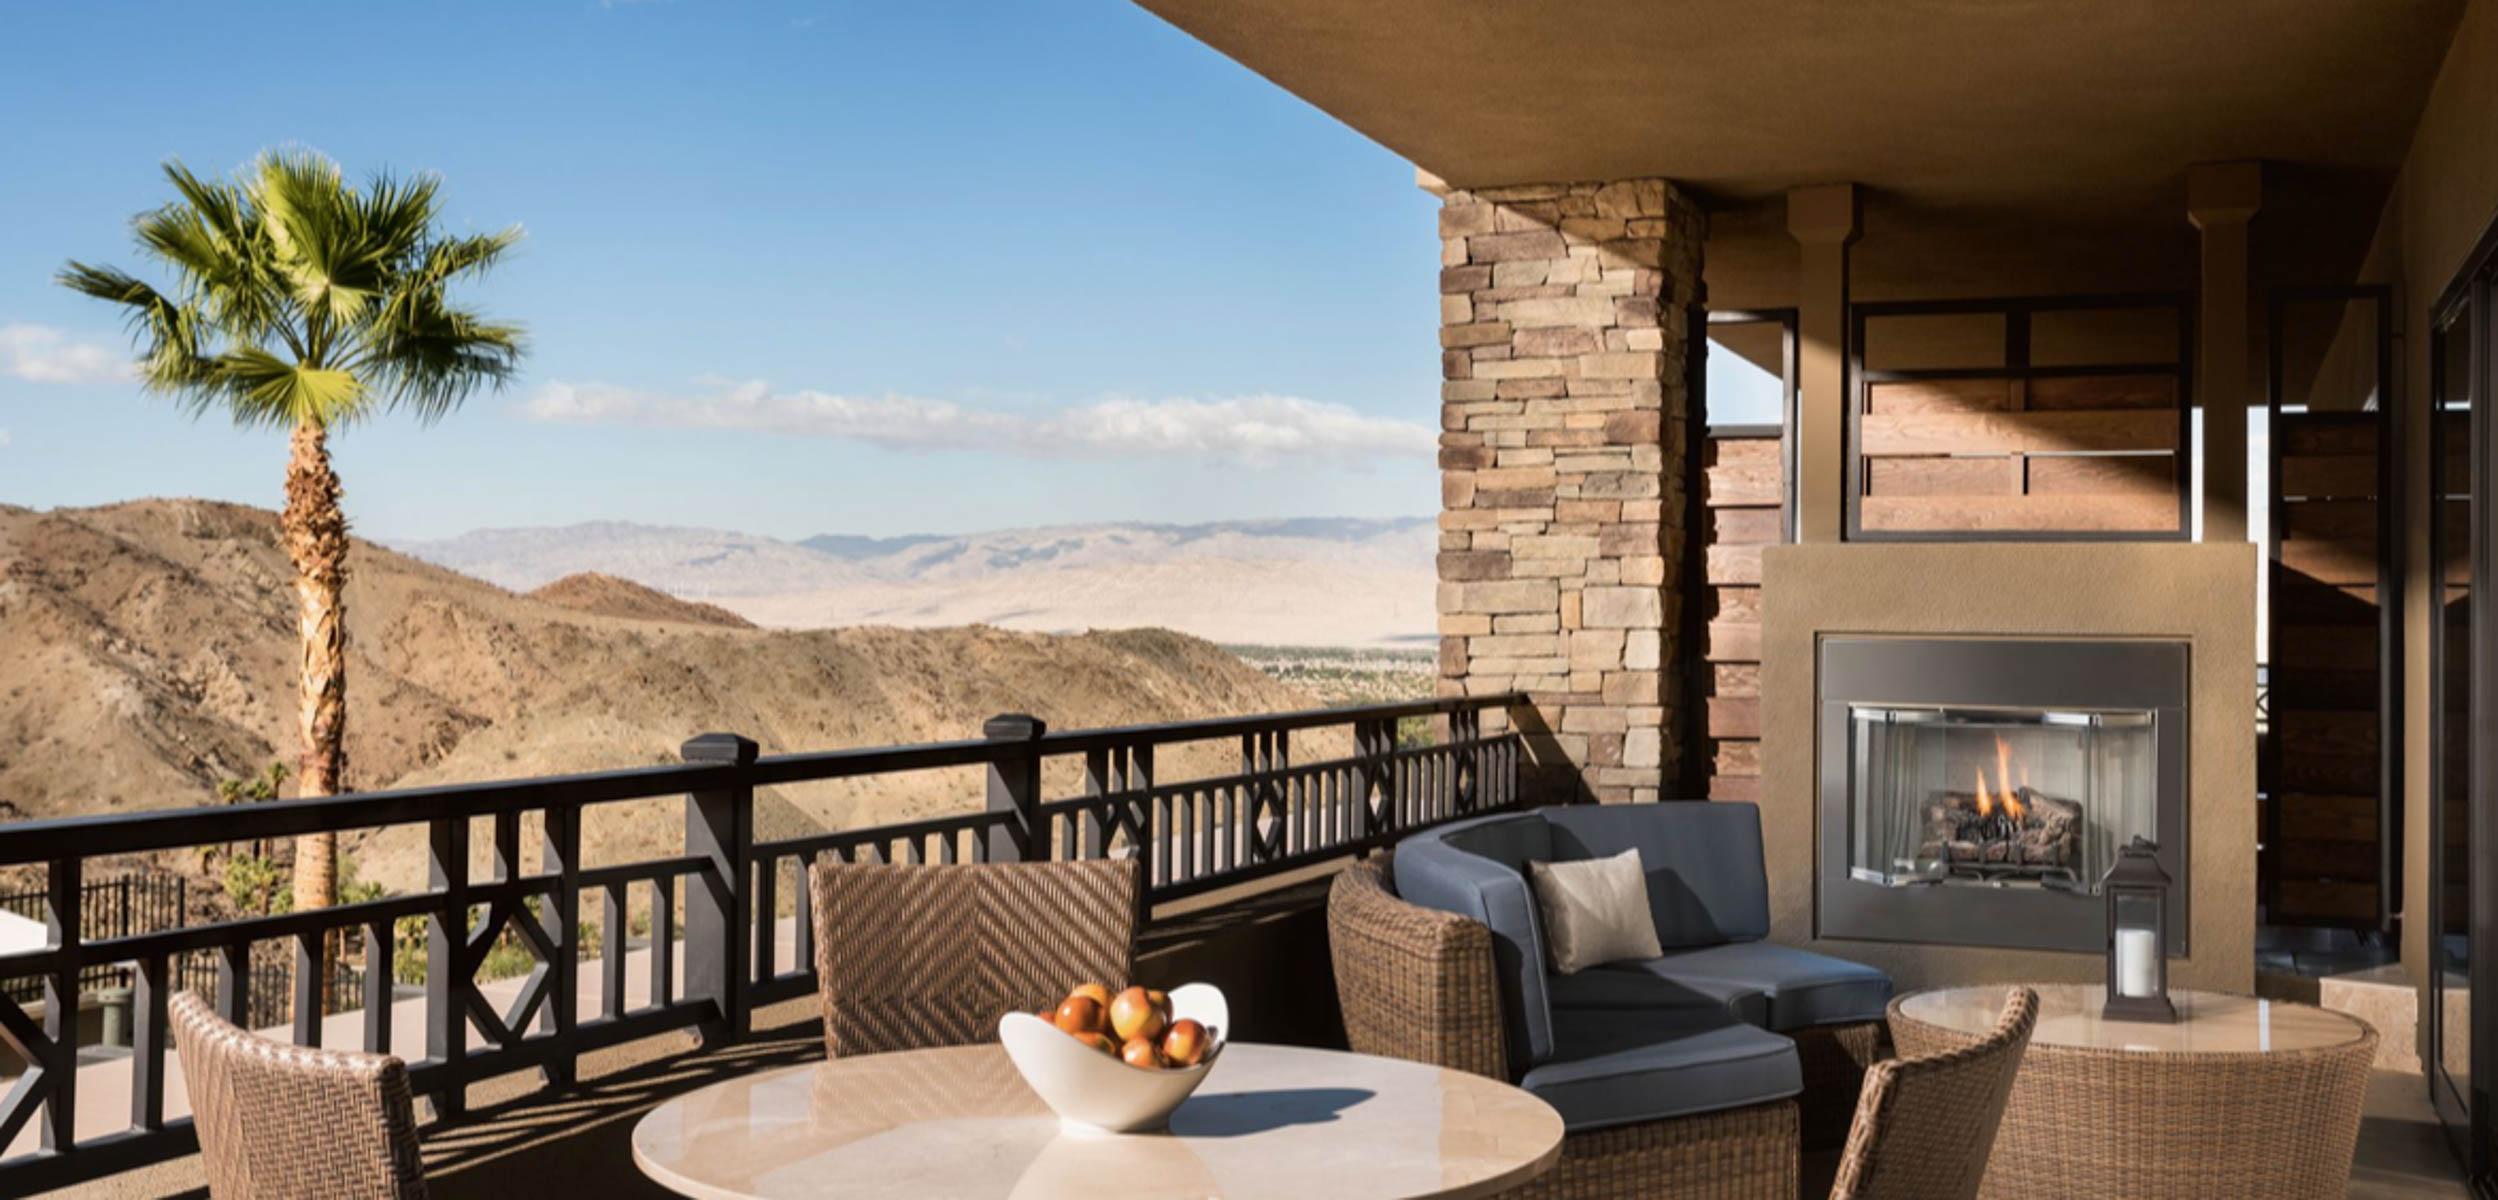 Best Palm Desert Travel Ideas_Palm Desert Hotels_Palm Desert_resorts_Addie Bell-16.jpg